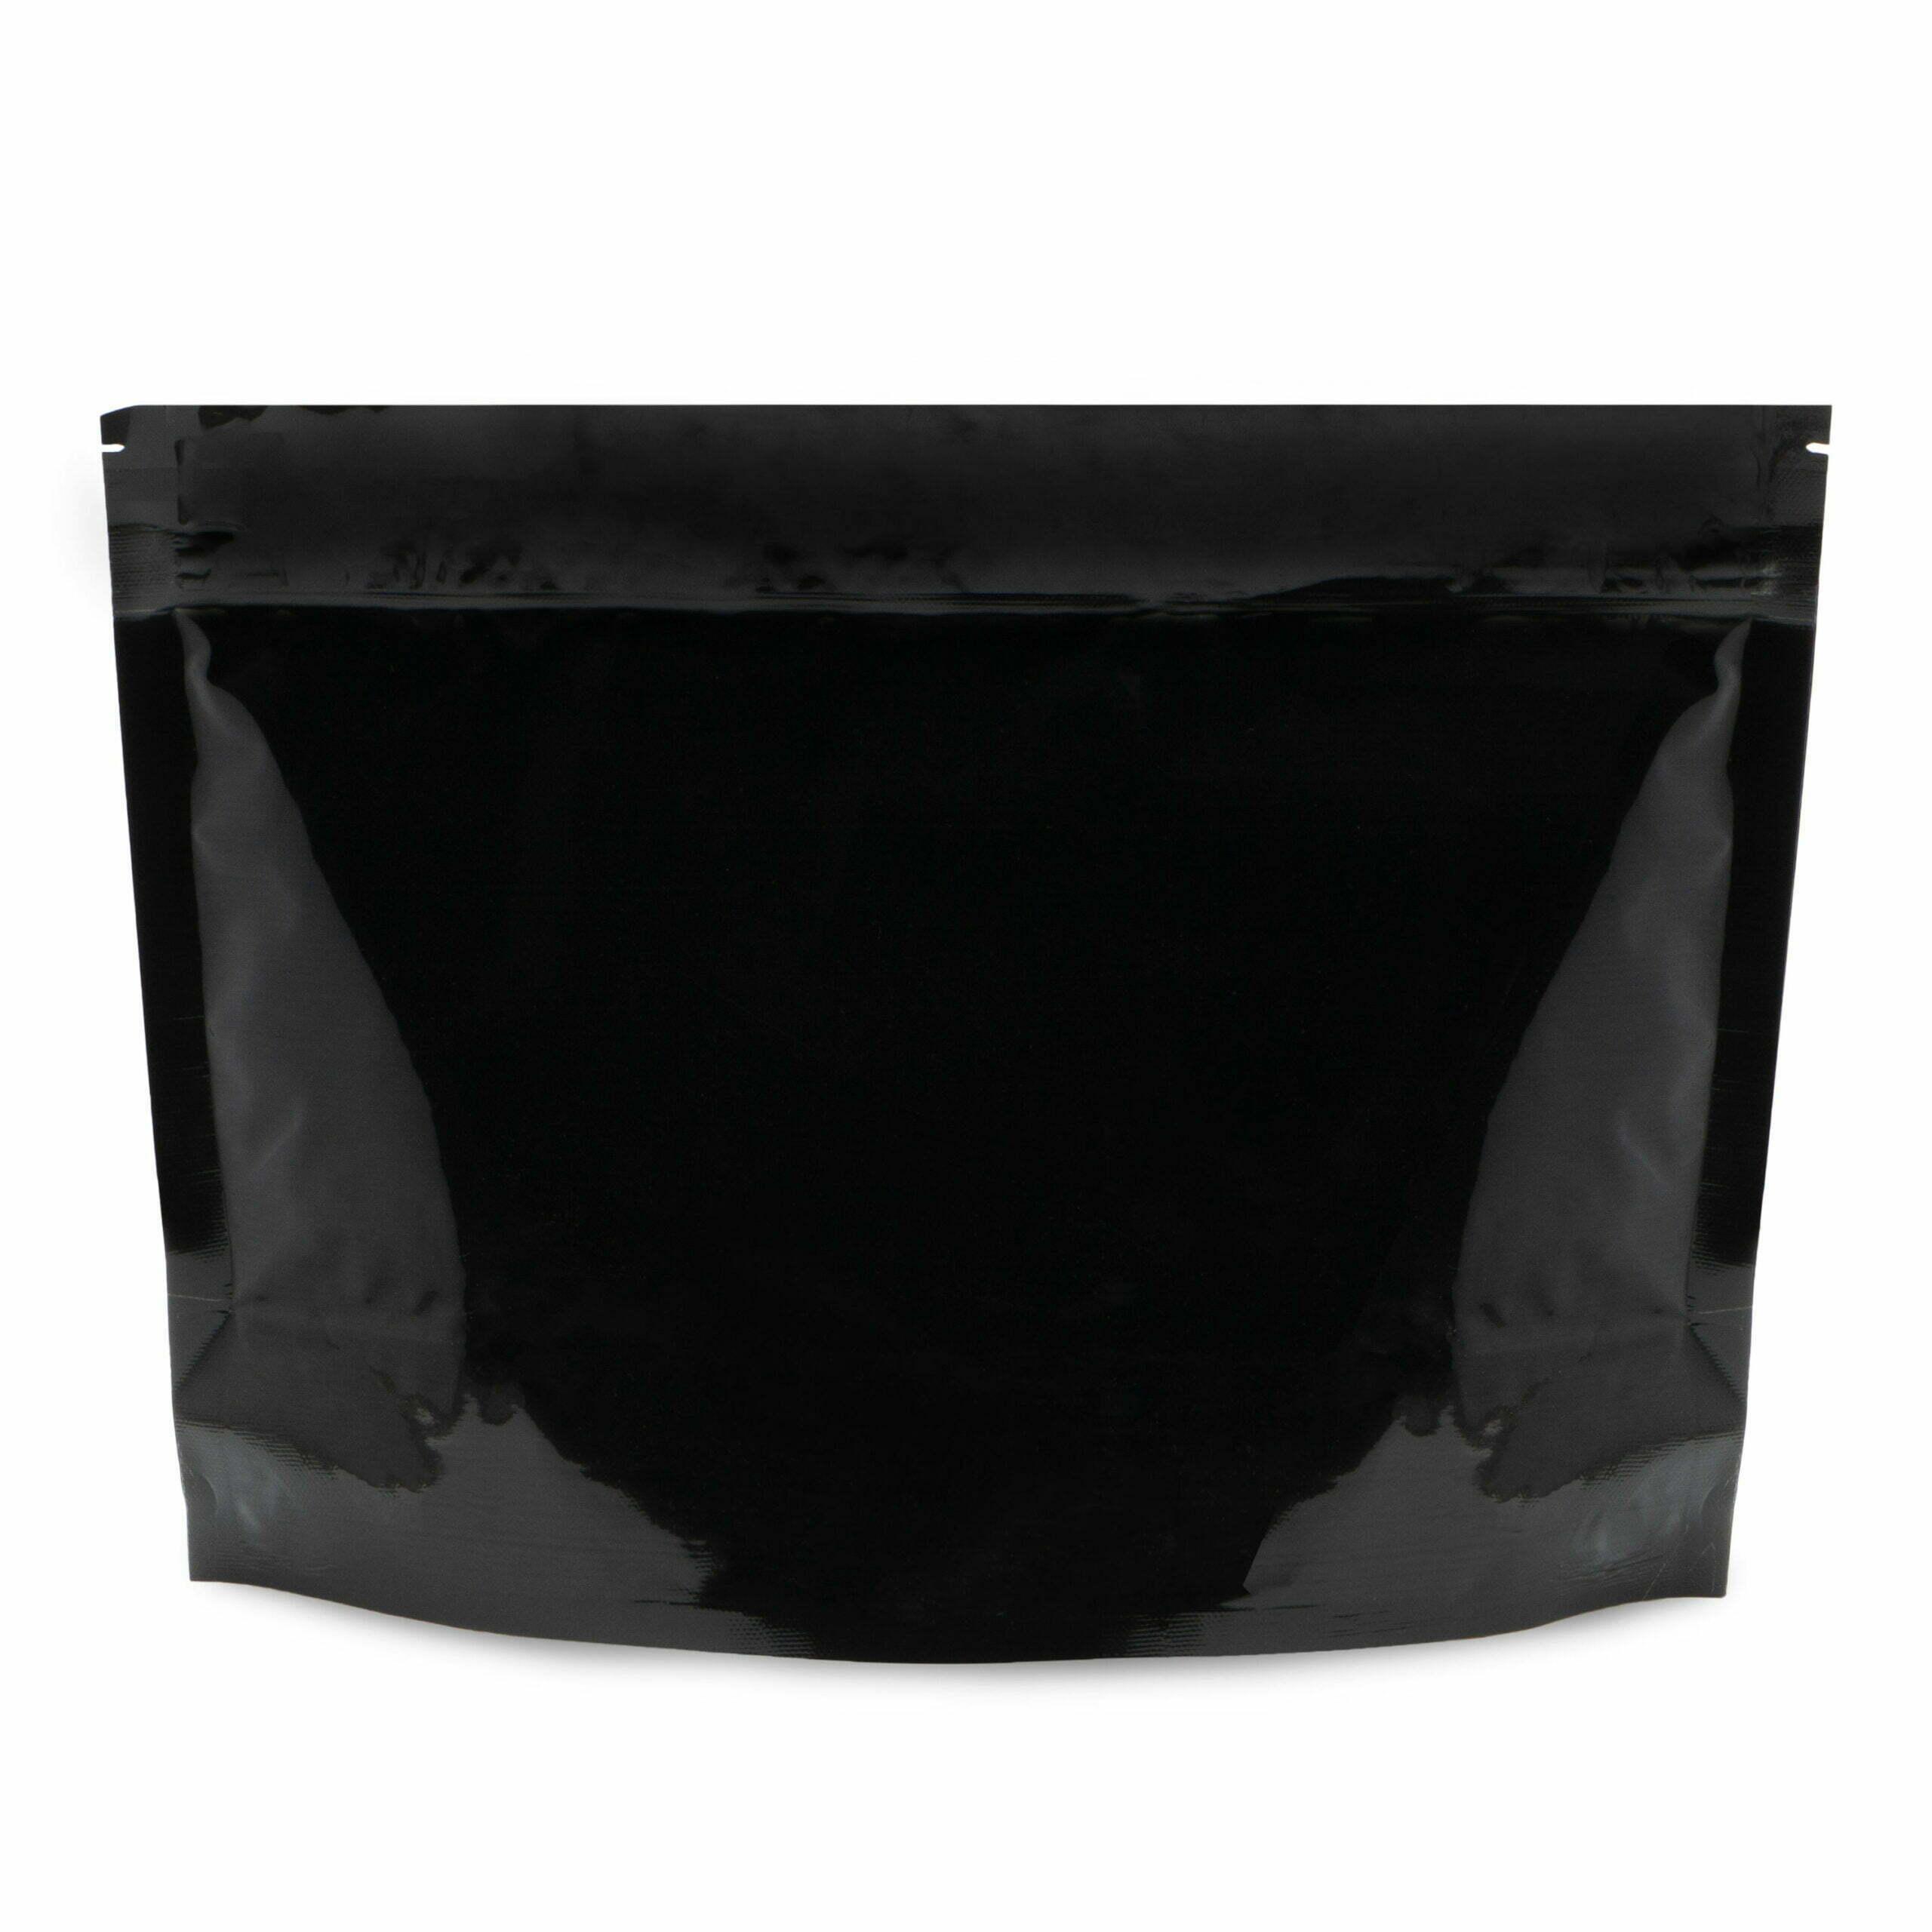 CareBlack Child Resistant 12×9×4 (Exit Bag) – 100 Pack